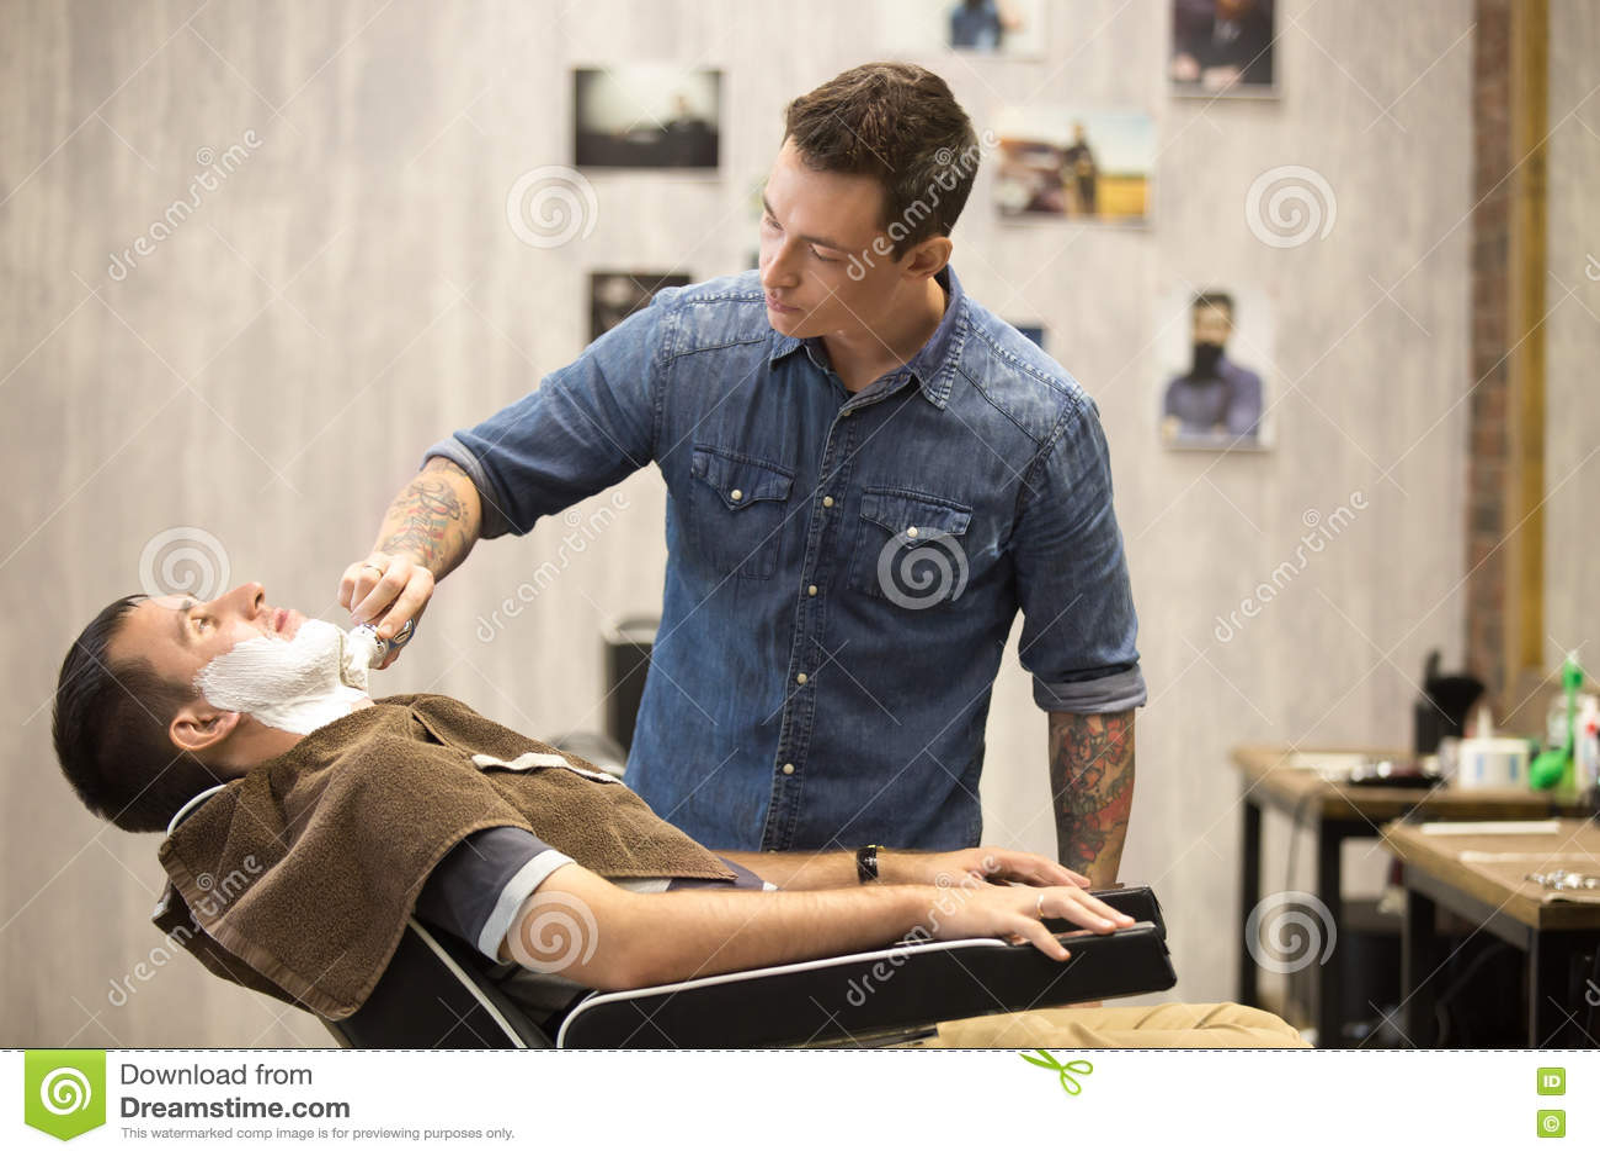 client getting beard shaving in barber shop stock photo. Black Bedroom Furniture Sets. Home Design Ideas